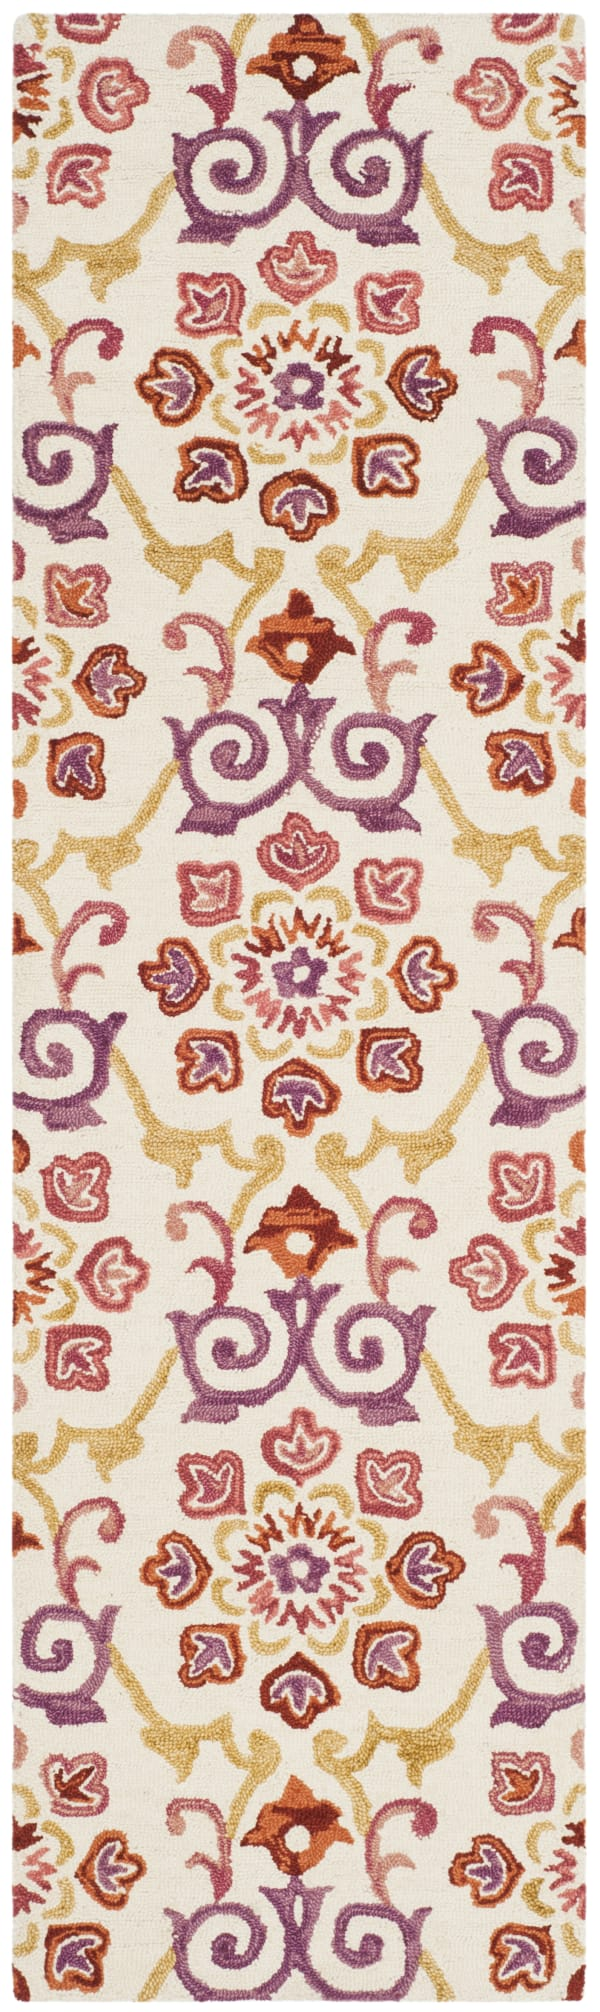 Safavieh Multicolored Wool Rug